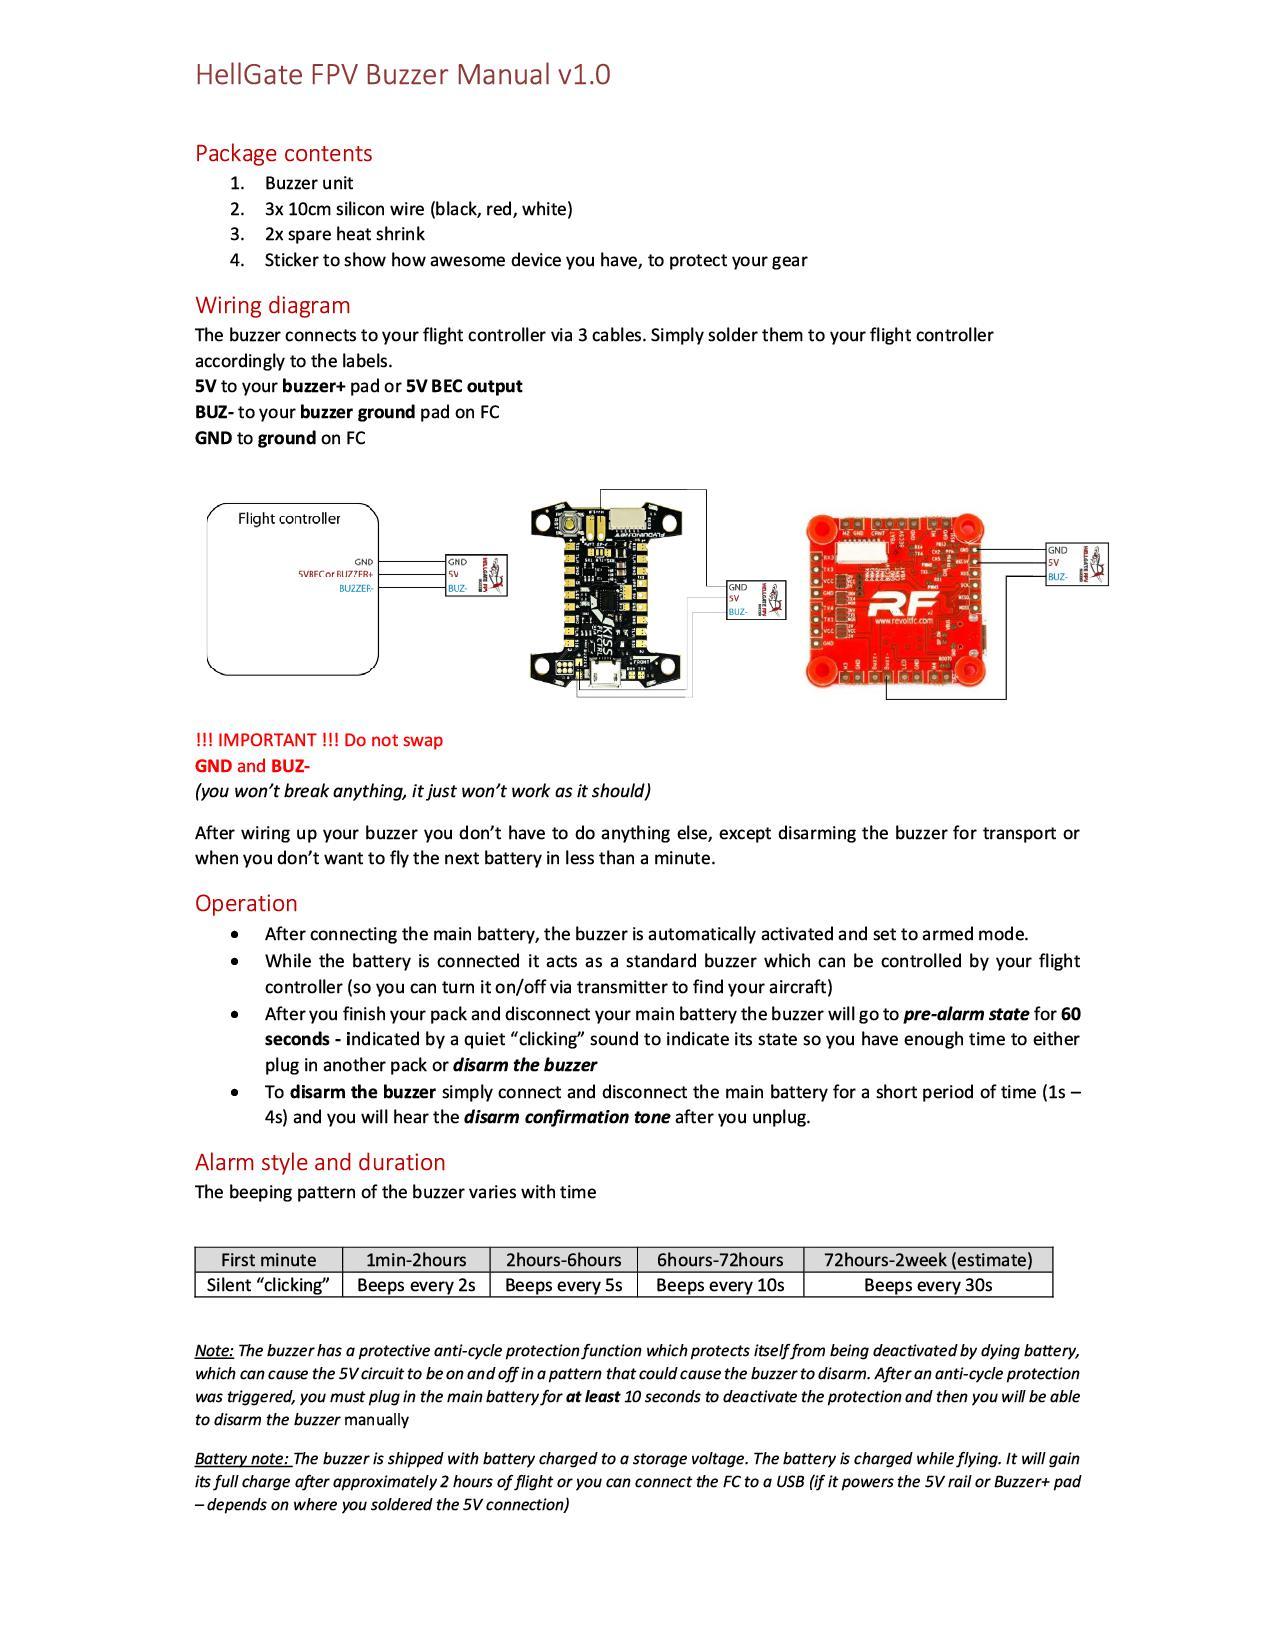 hellgatebuzzer-manual.jpg